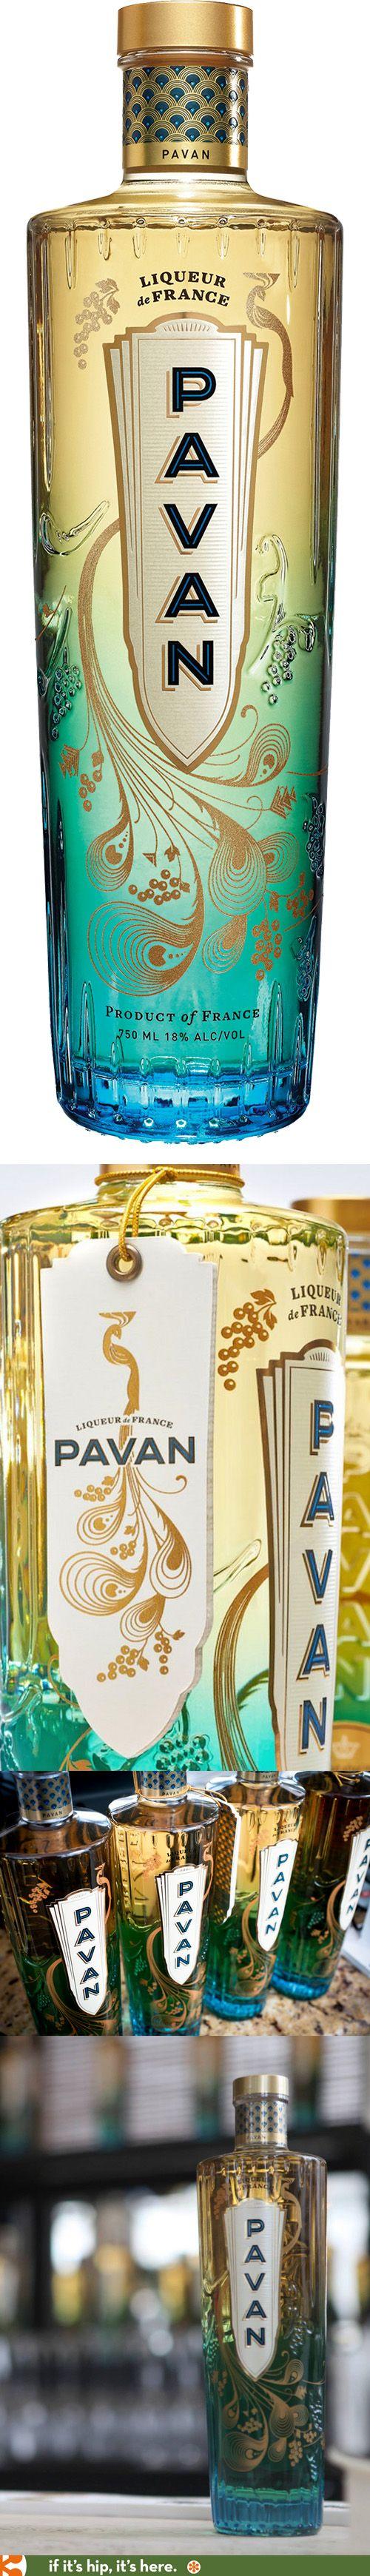 Pavan Liqueur's peacock-inspired bottle is one of the prettiest I've ever seen.